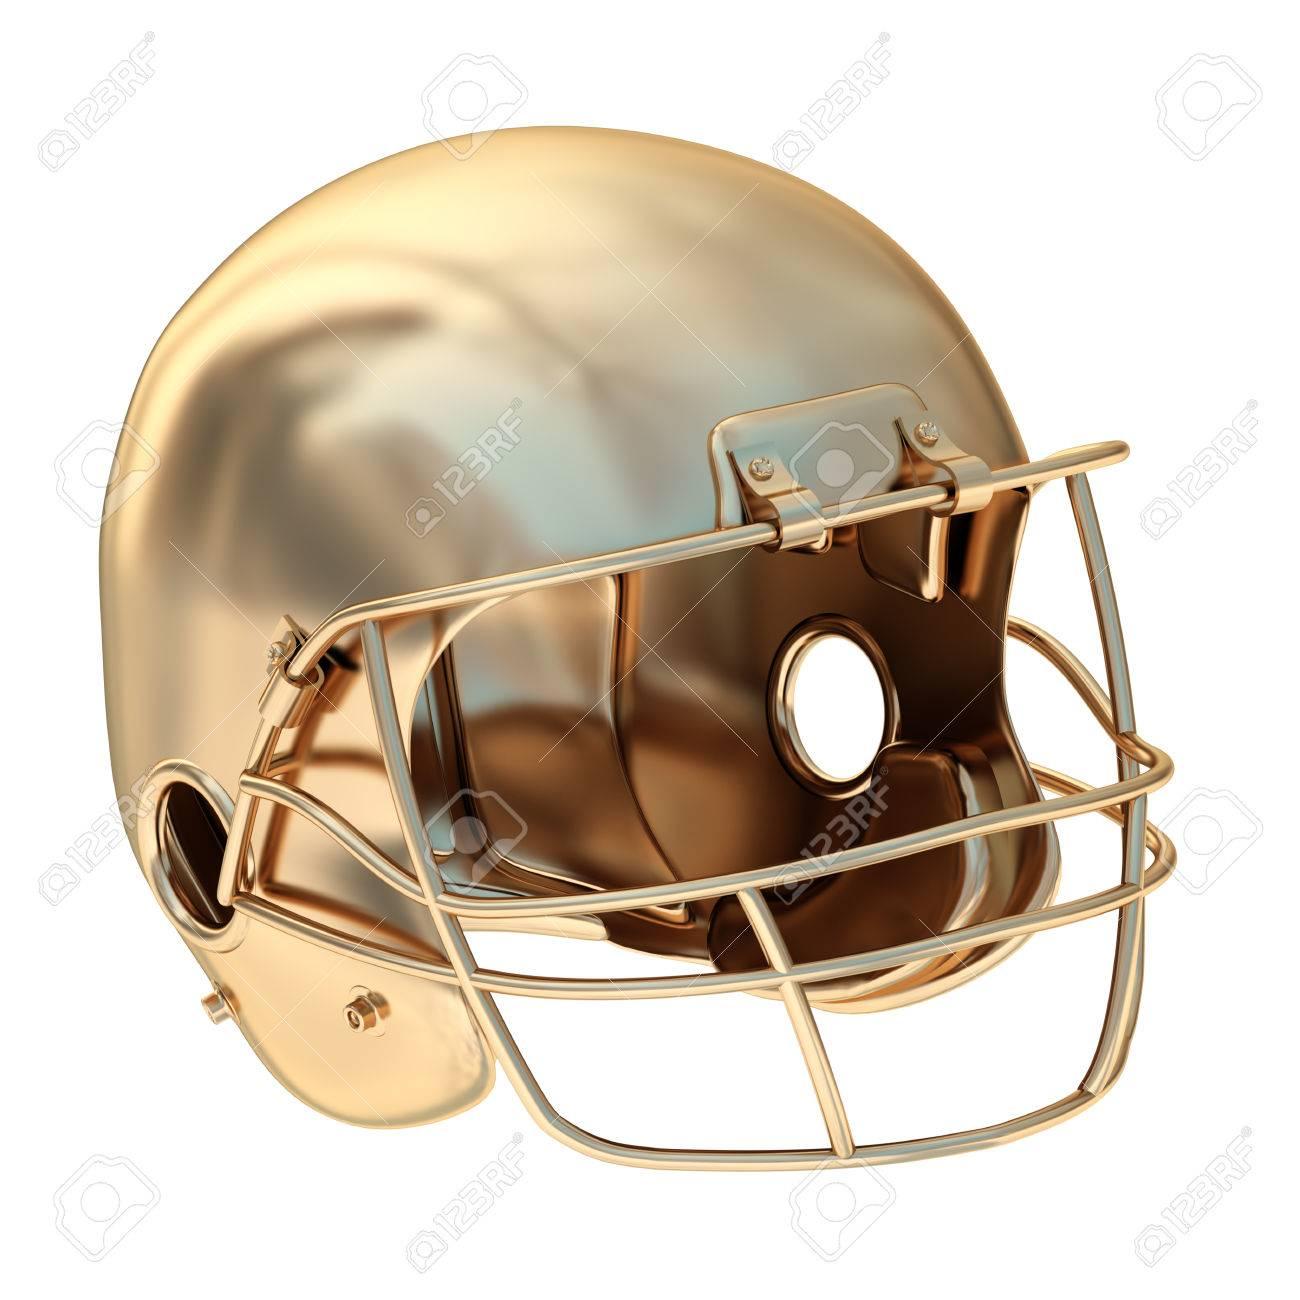 37ab6a59ee Colección de objetos de oro. casco de fútbol americano de oro. aislado  sobre fondo